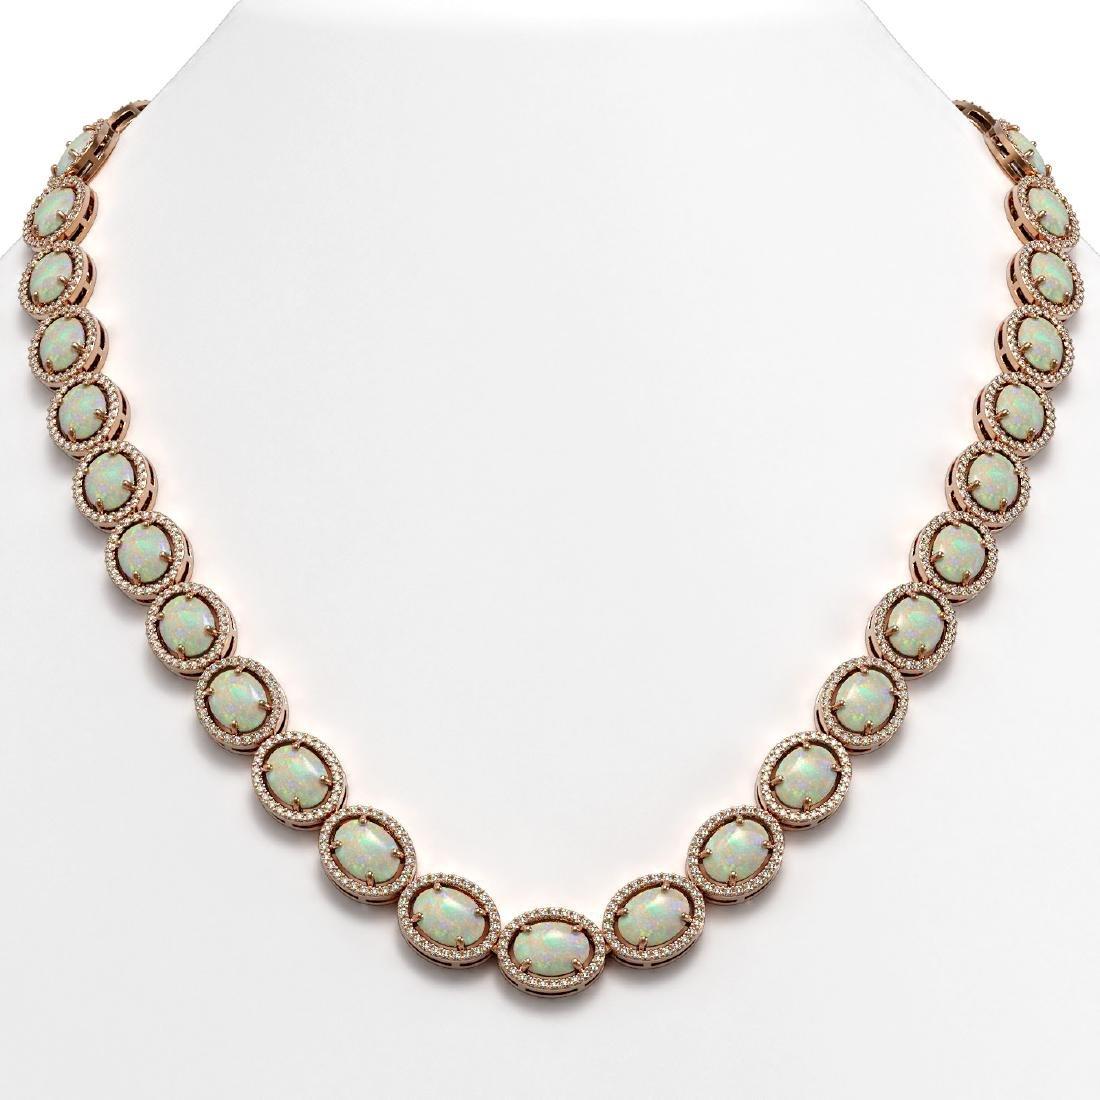 42.29 CTW Opal & Diamond Halo Necklace 10K Rose Gold